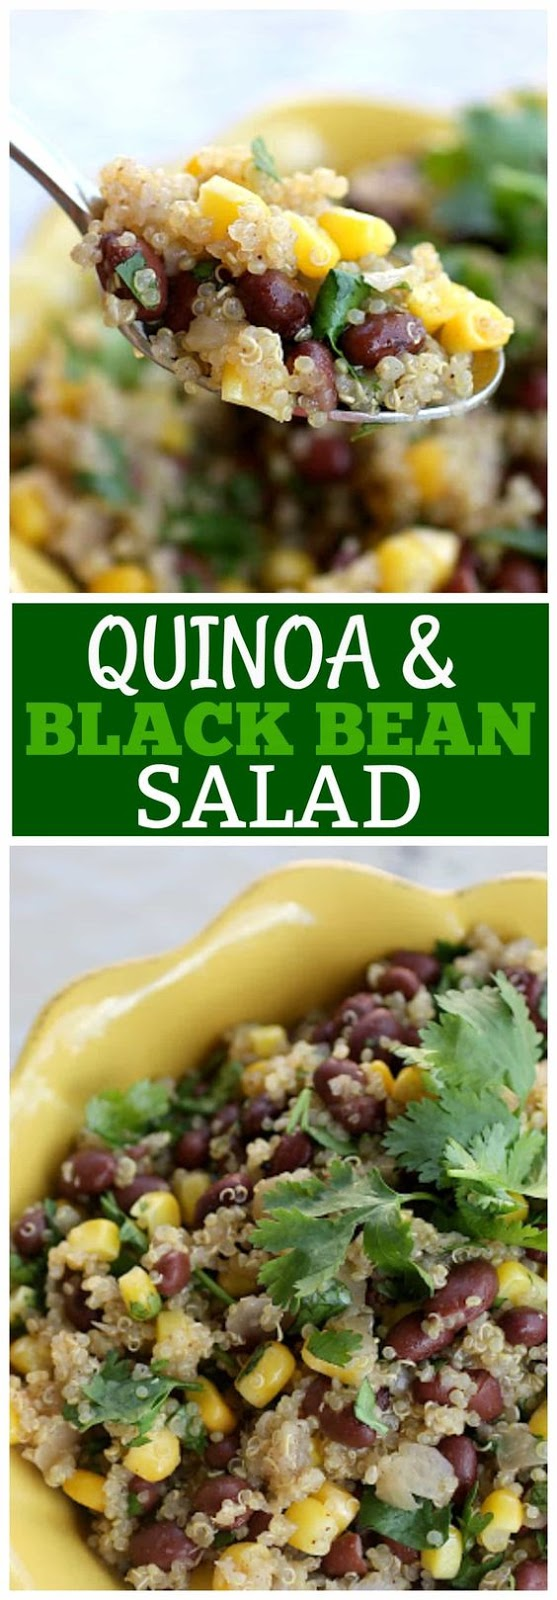 Quinoa and Black Bean Salad (Vegan)